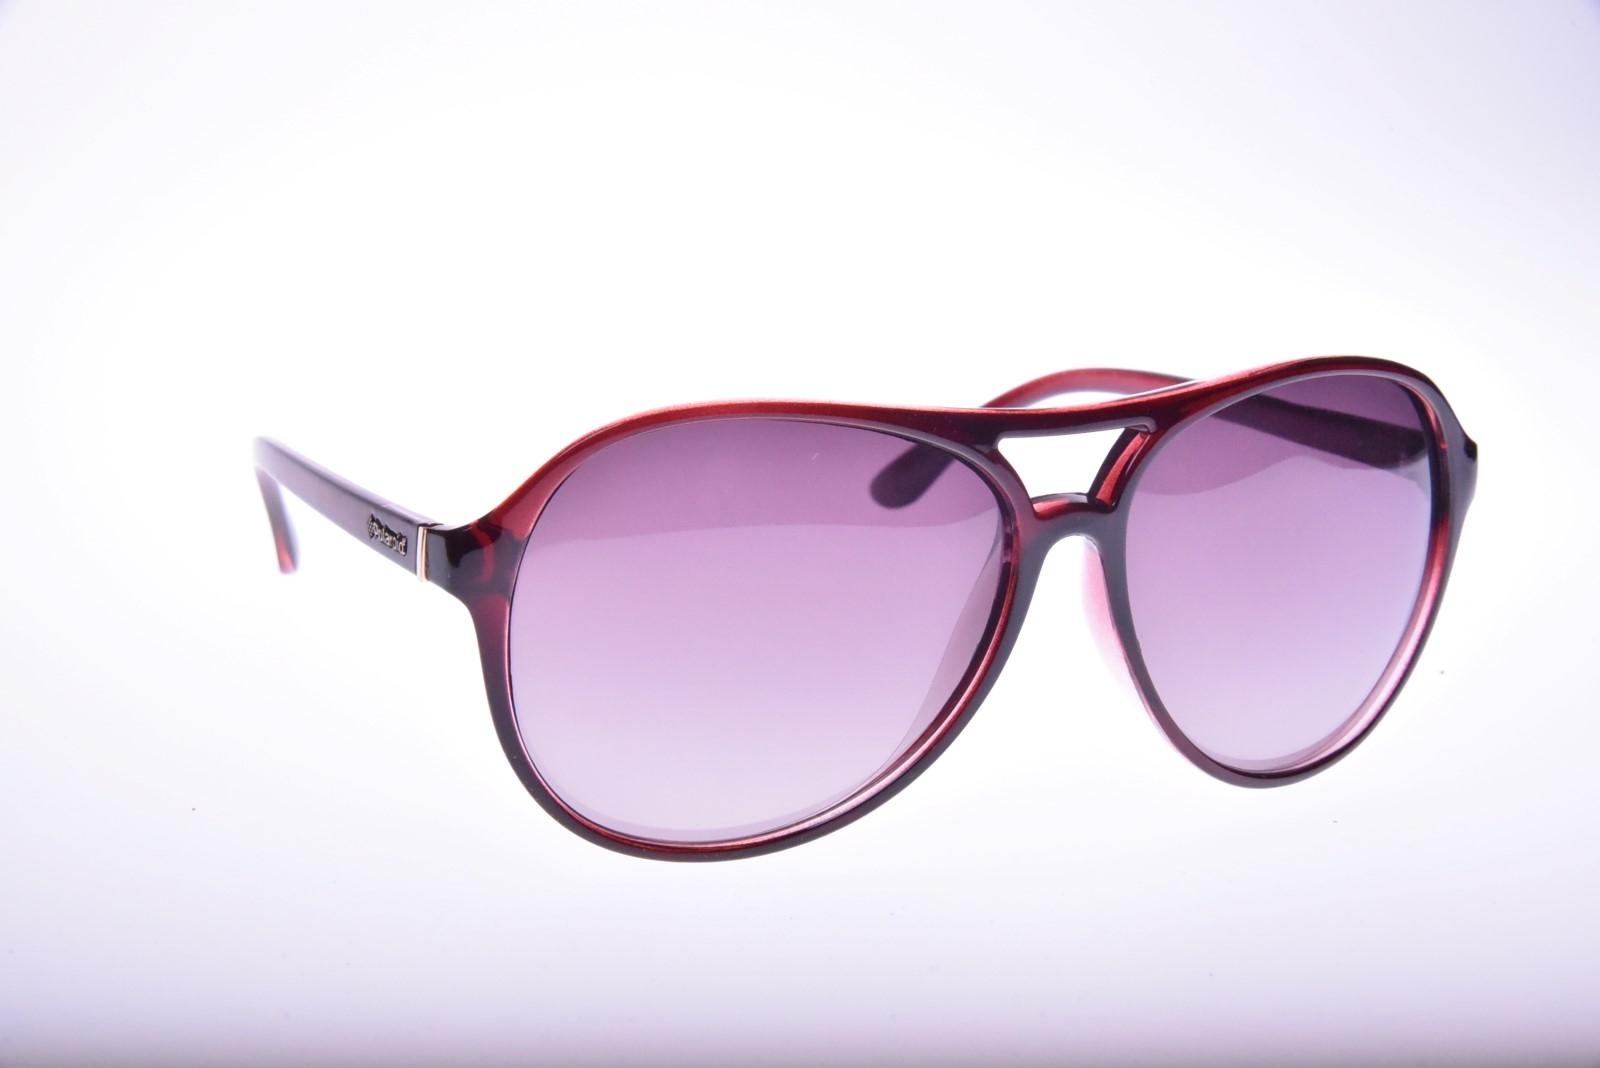 Polaroid Superior F8212B - Unisex slnečné okuliare